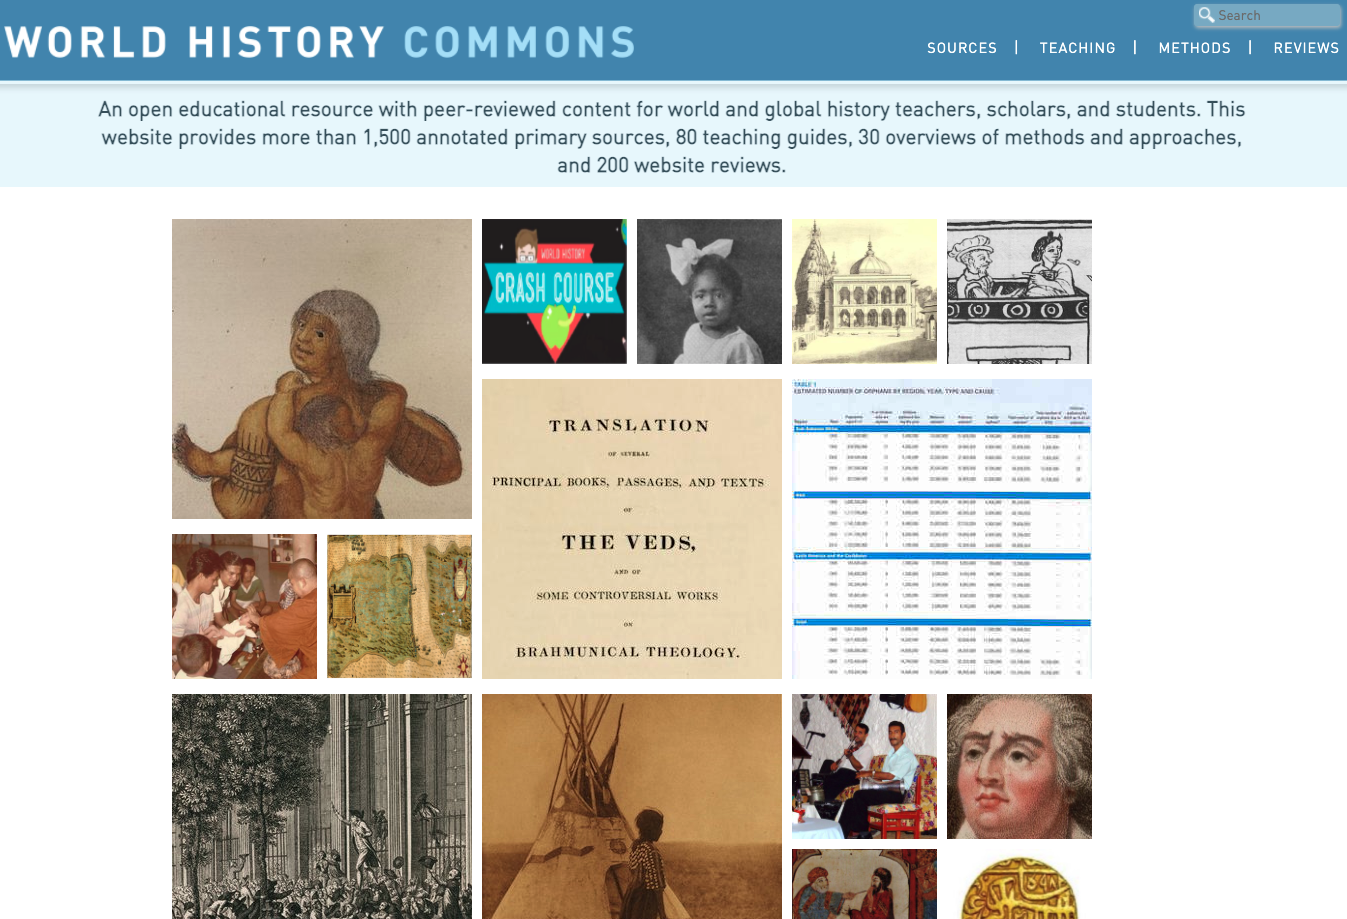 World History Commons